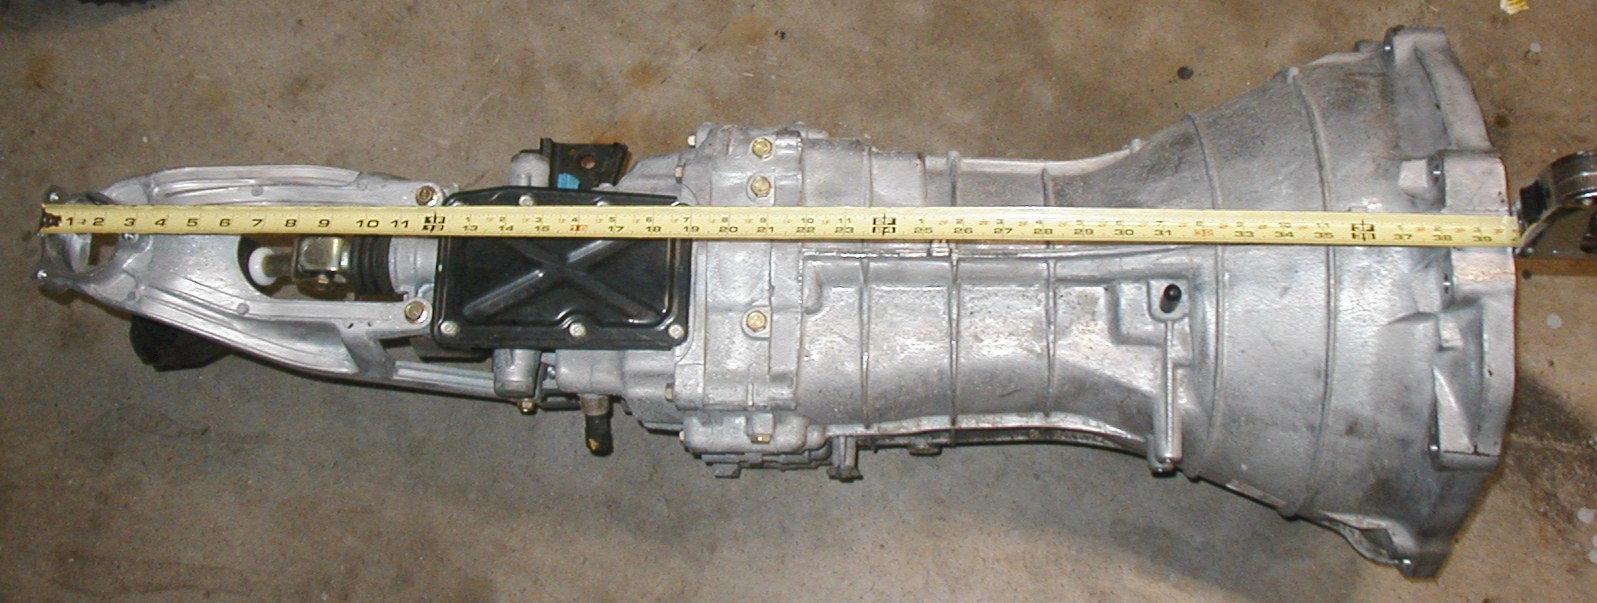 1jz gearbox options - RX7Club com - Mazda RX7 Forum